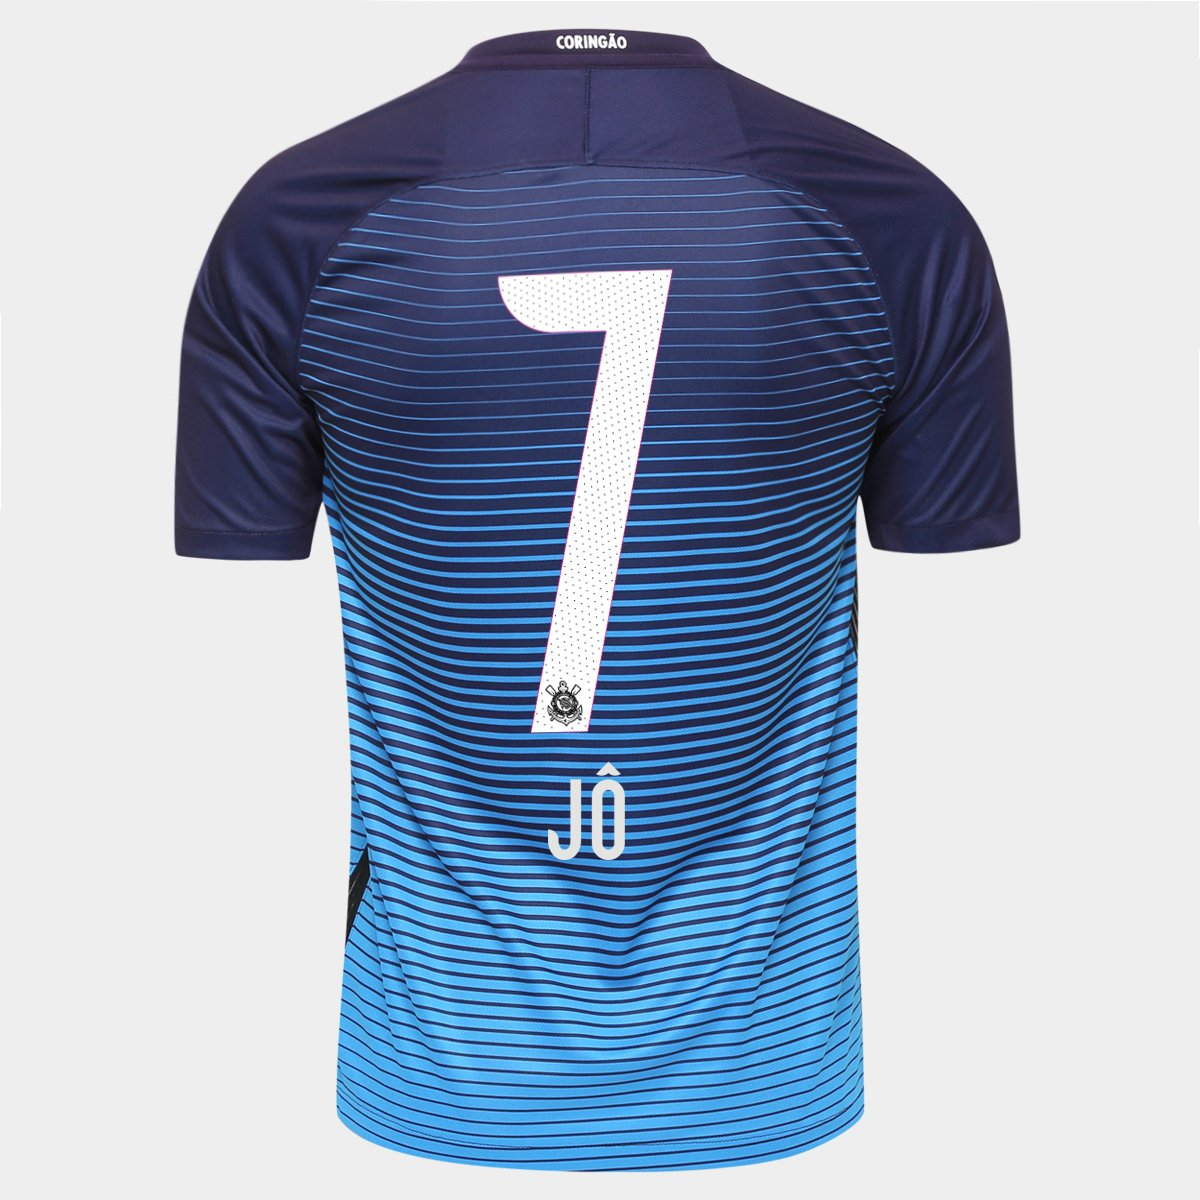 Camisa Nike Corinthians III 2016 nº 7 - Jô - Compre Agora  8d91ddf35458d